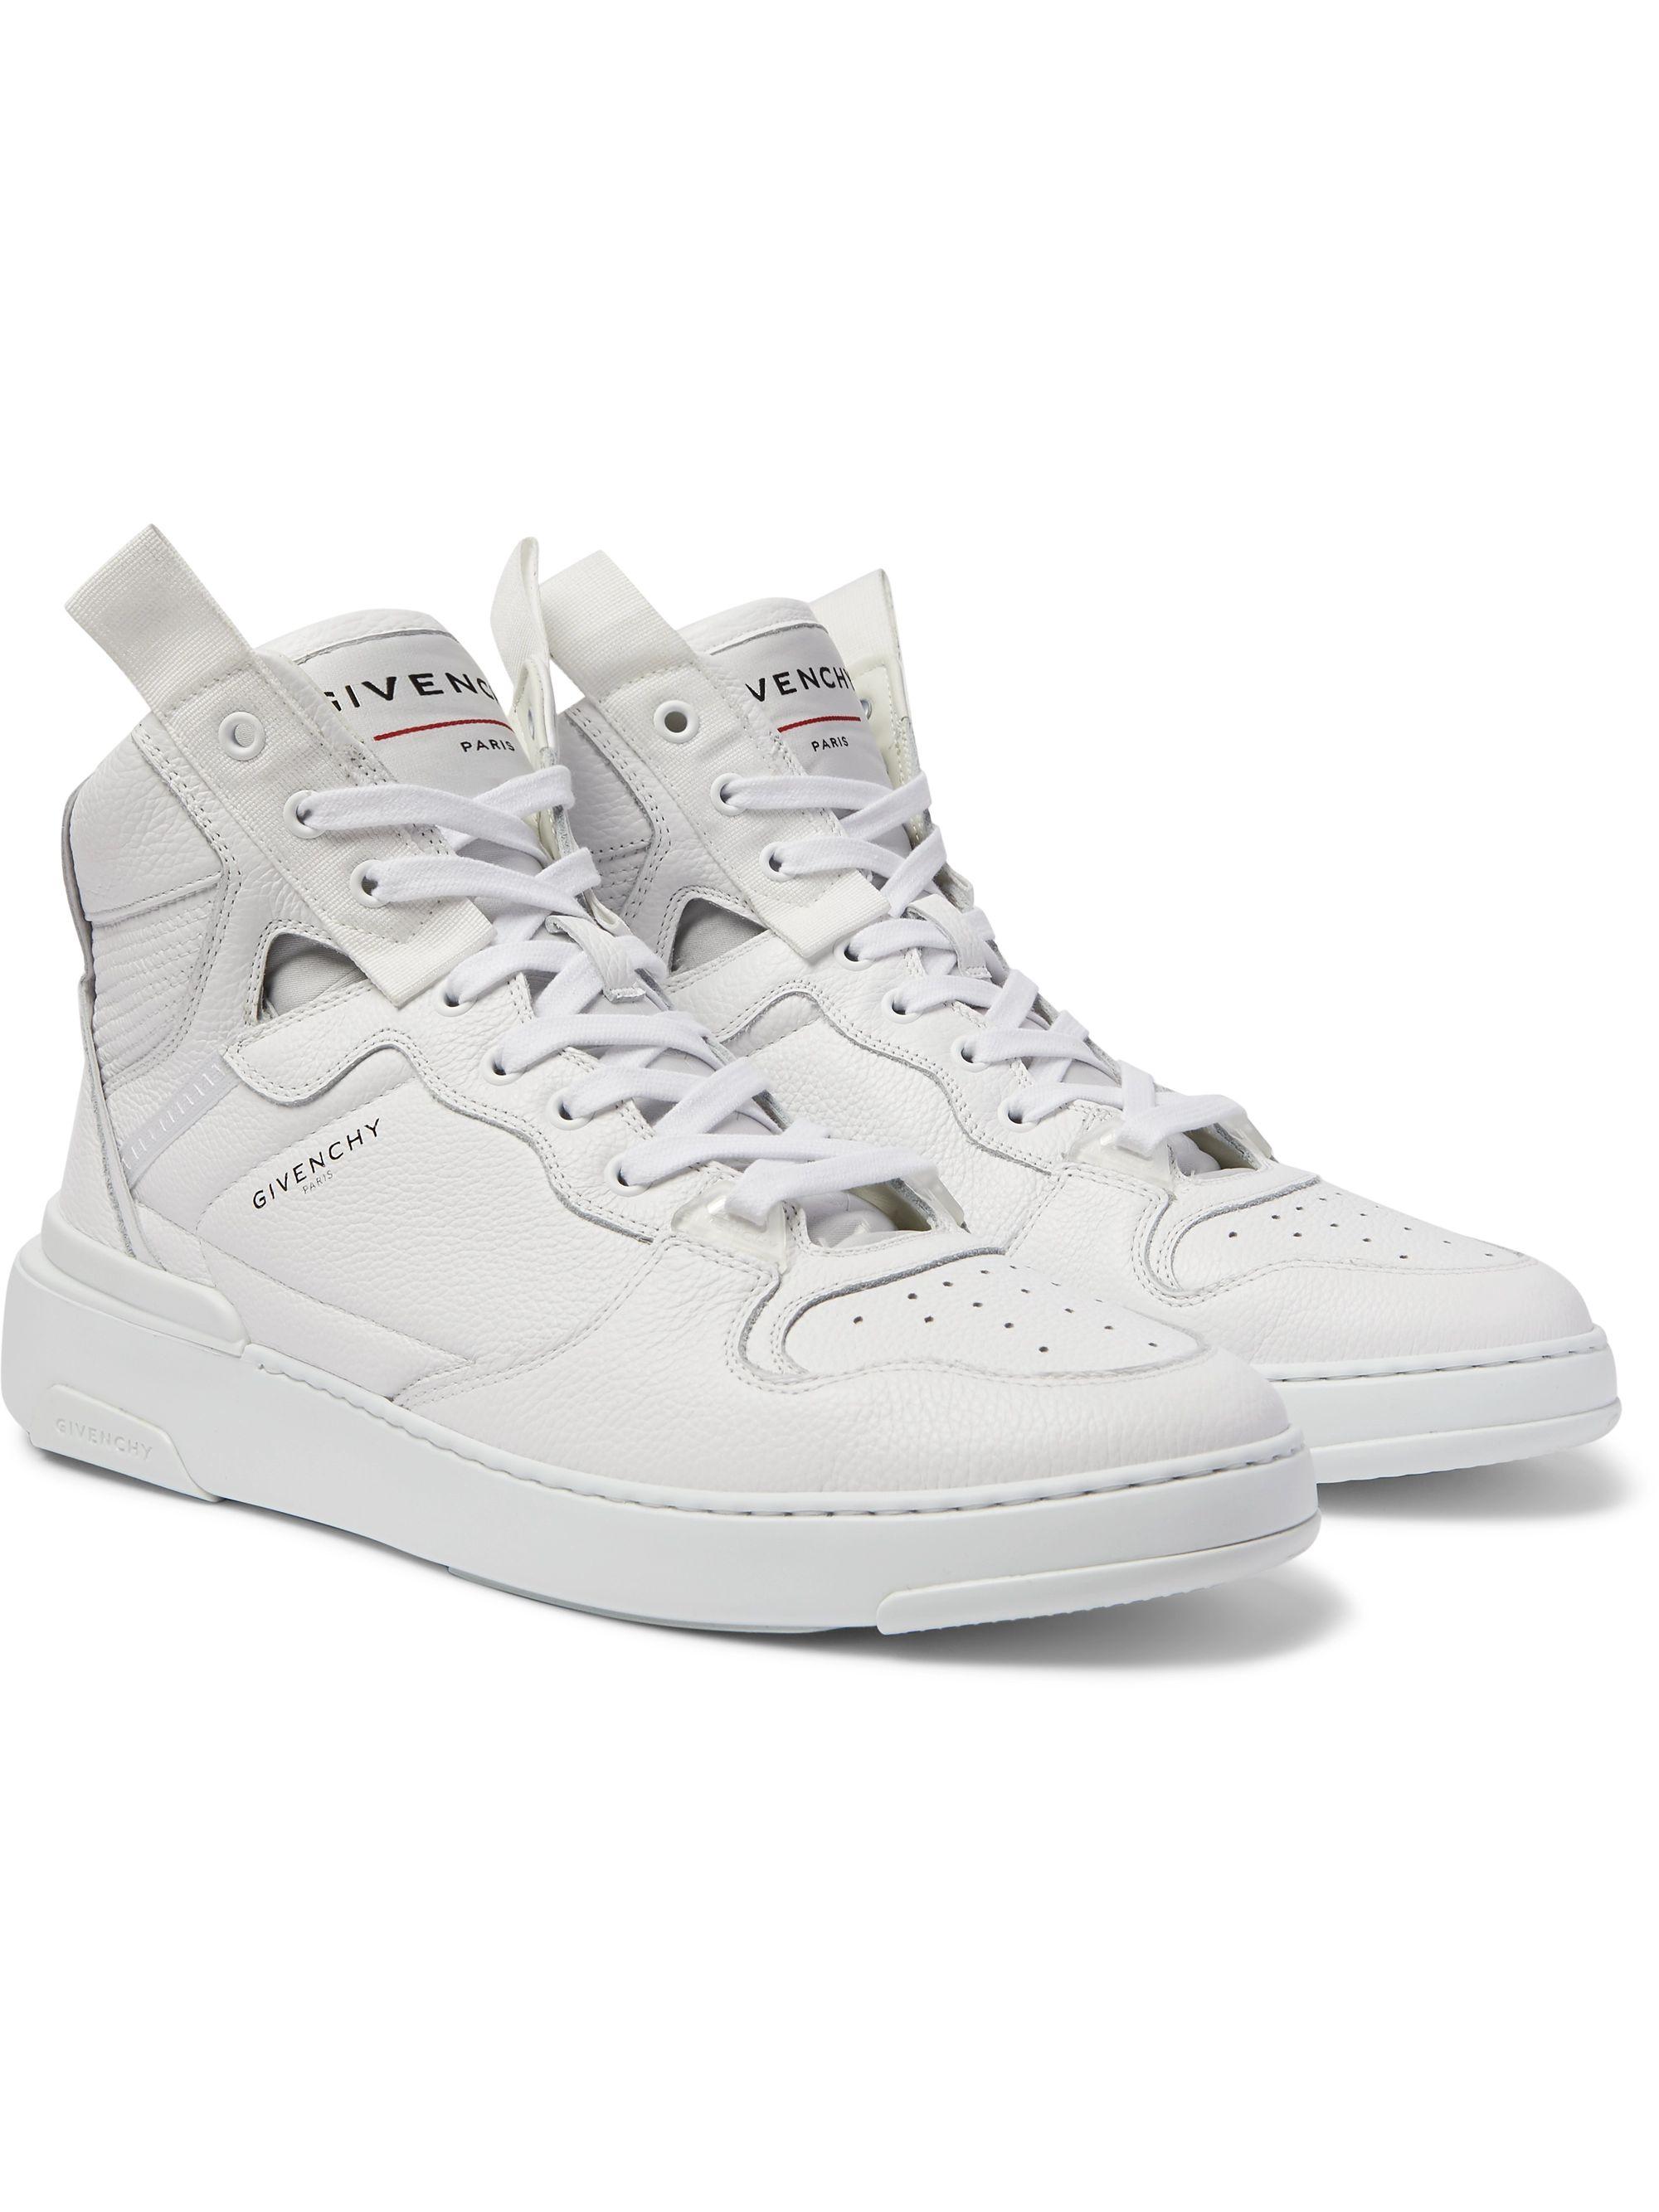 Wing Grosgrain Trimmed Full Grain Leather High Top Sneakers